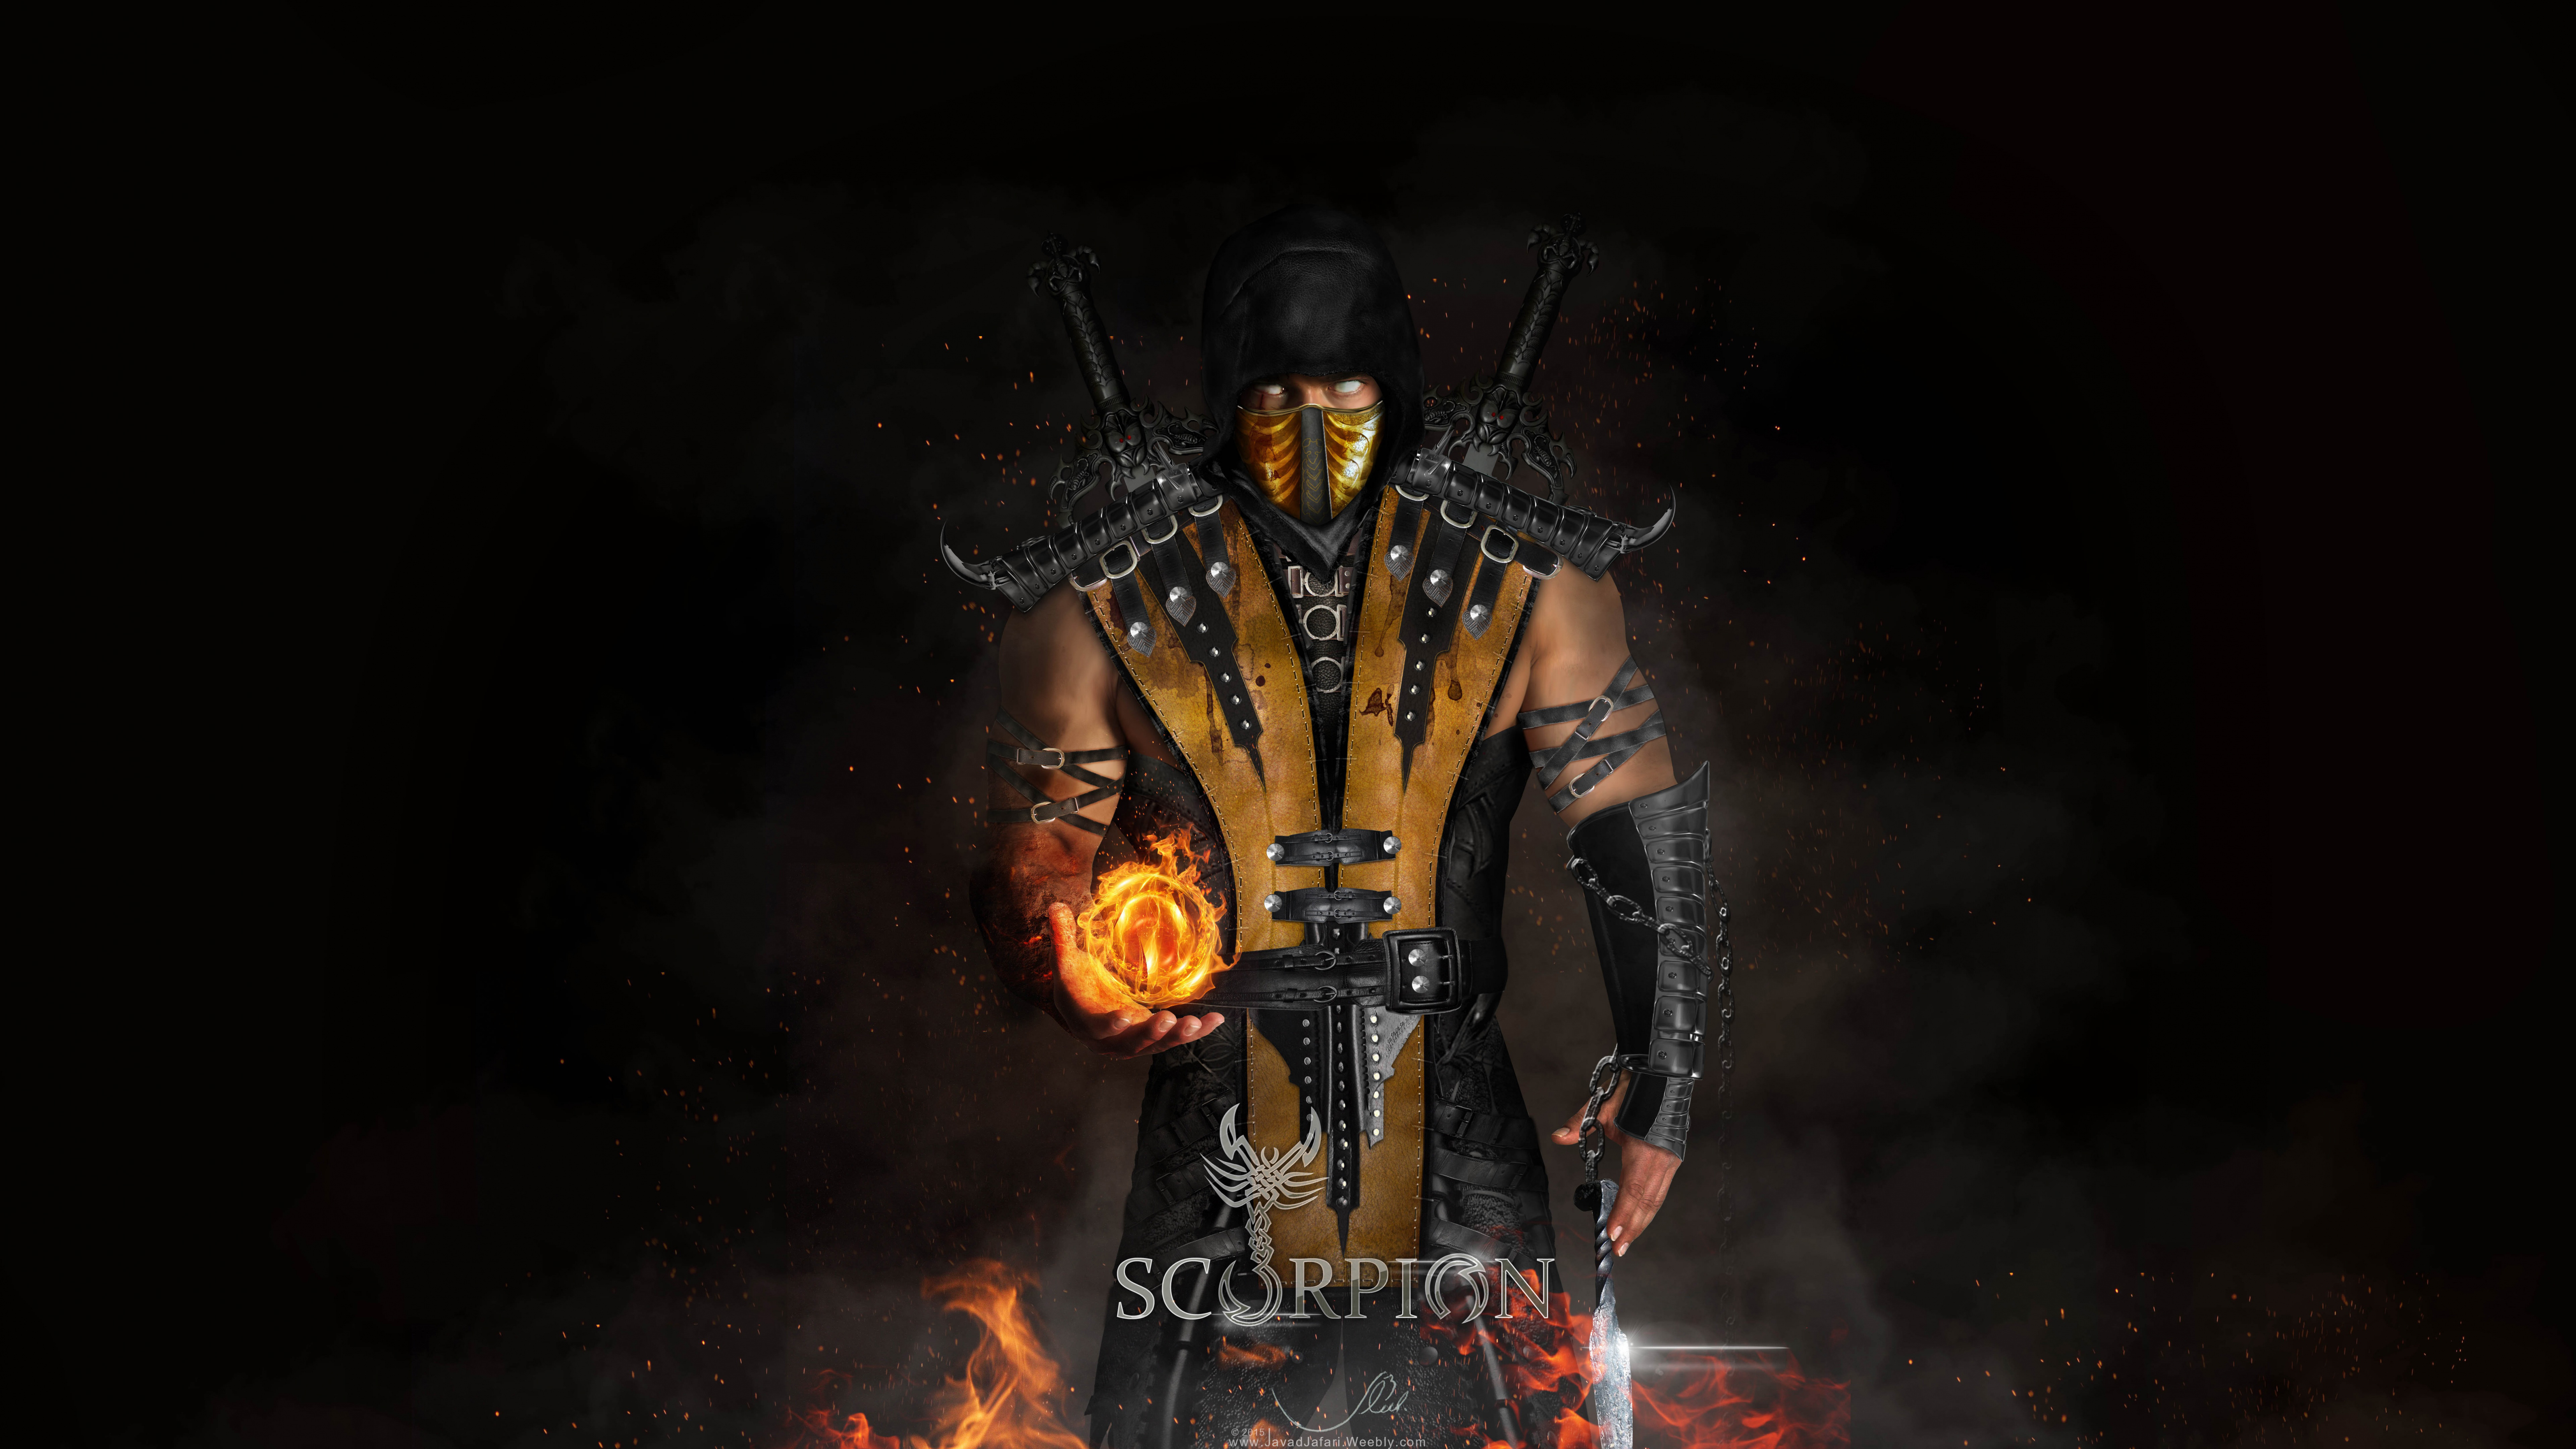 scorpion-mortal-kombat-x-8k-fk.jpg